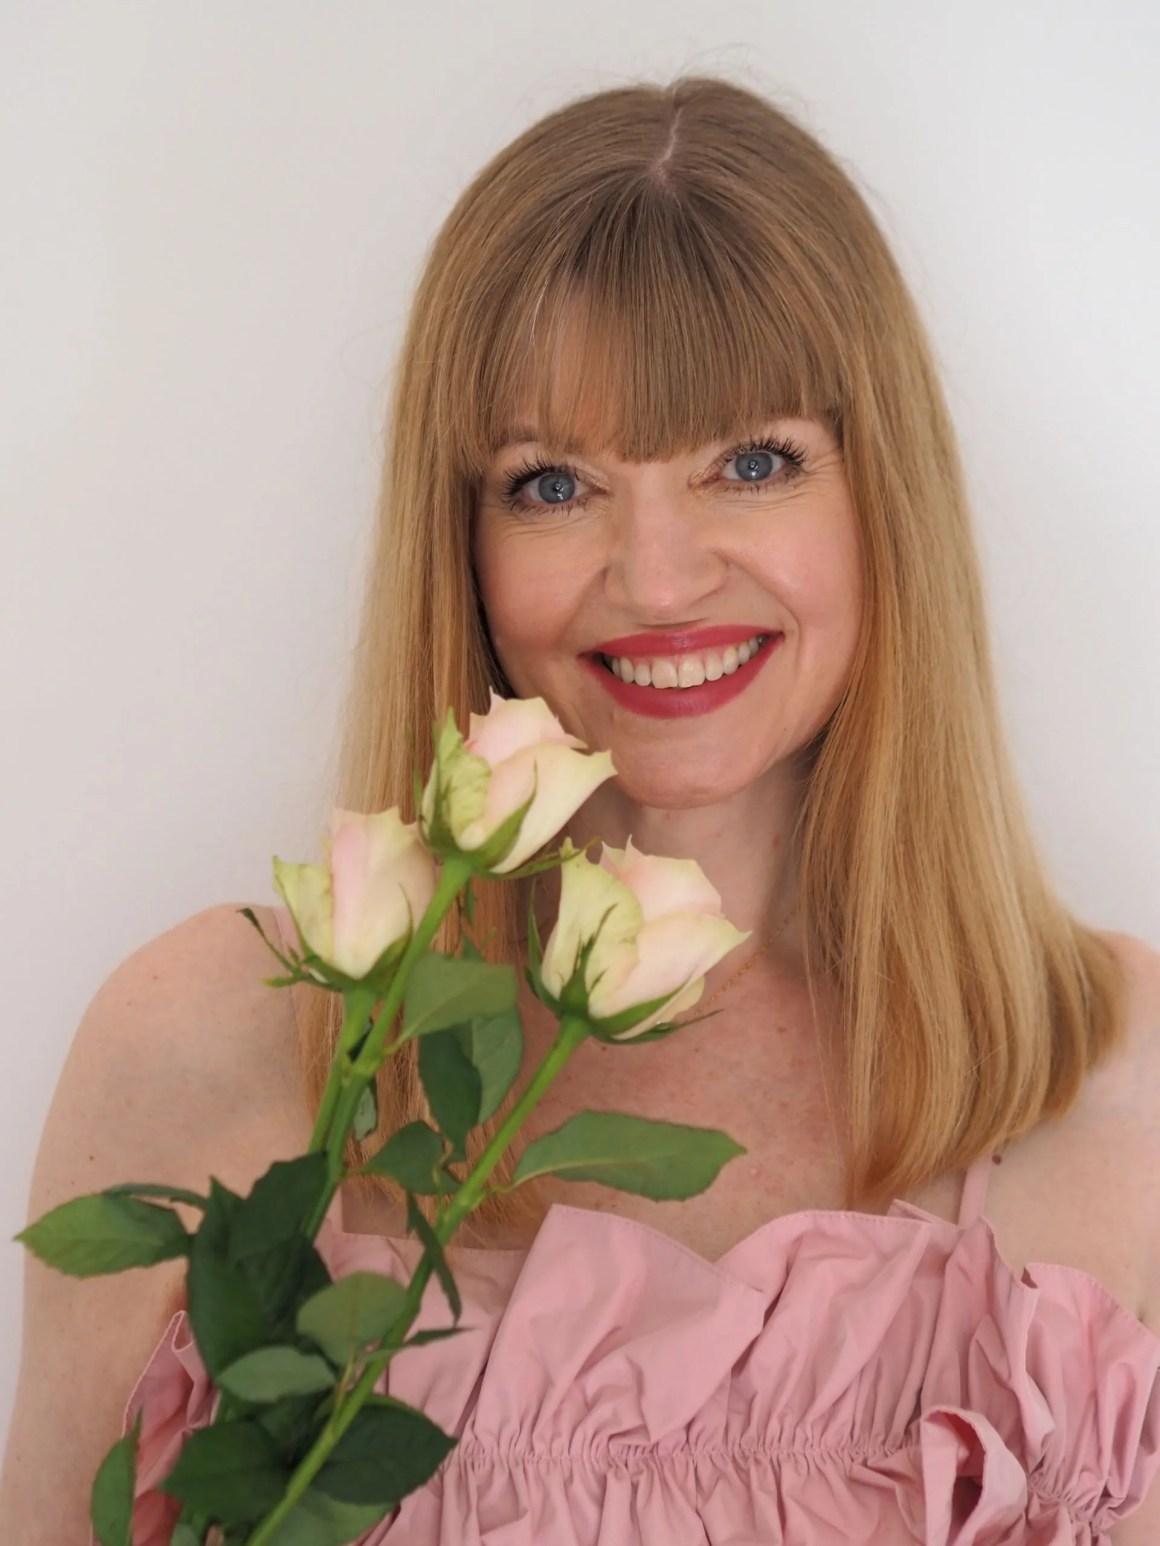 woman wearing blush pink dress holding pale roses